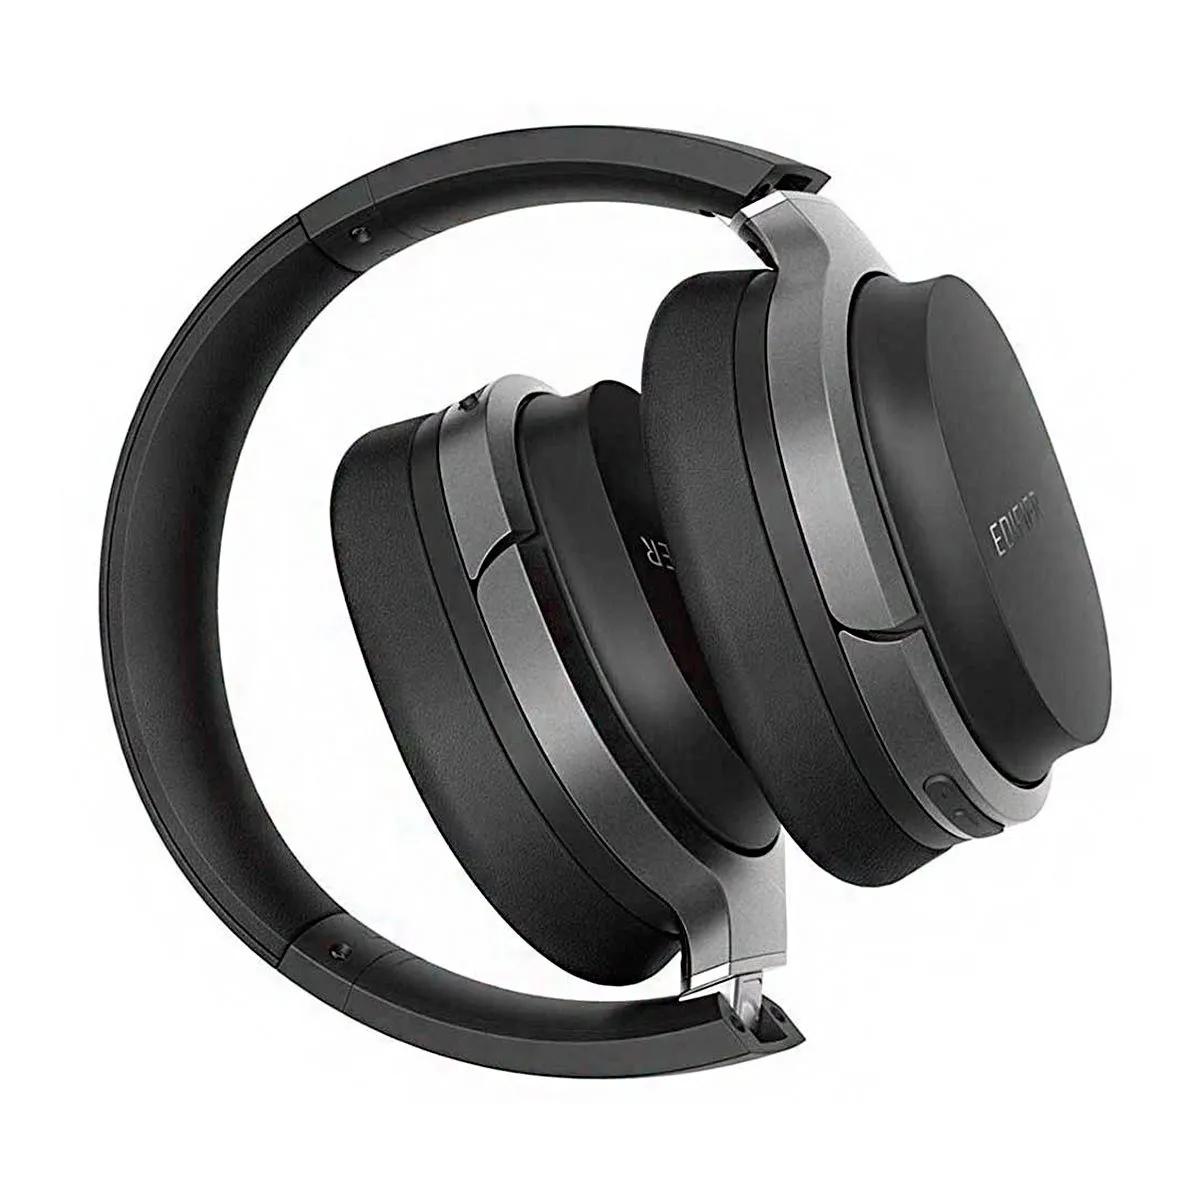 Fone de Ouvido Edifier W830BT Stereo Bluetooth Over Ear Hi-Fi Black